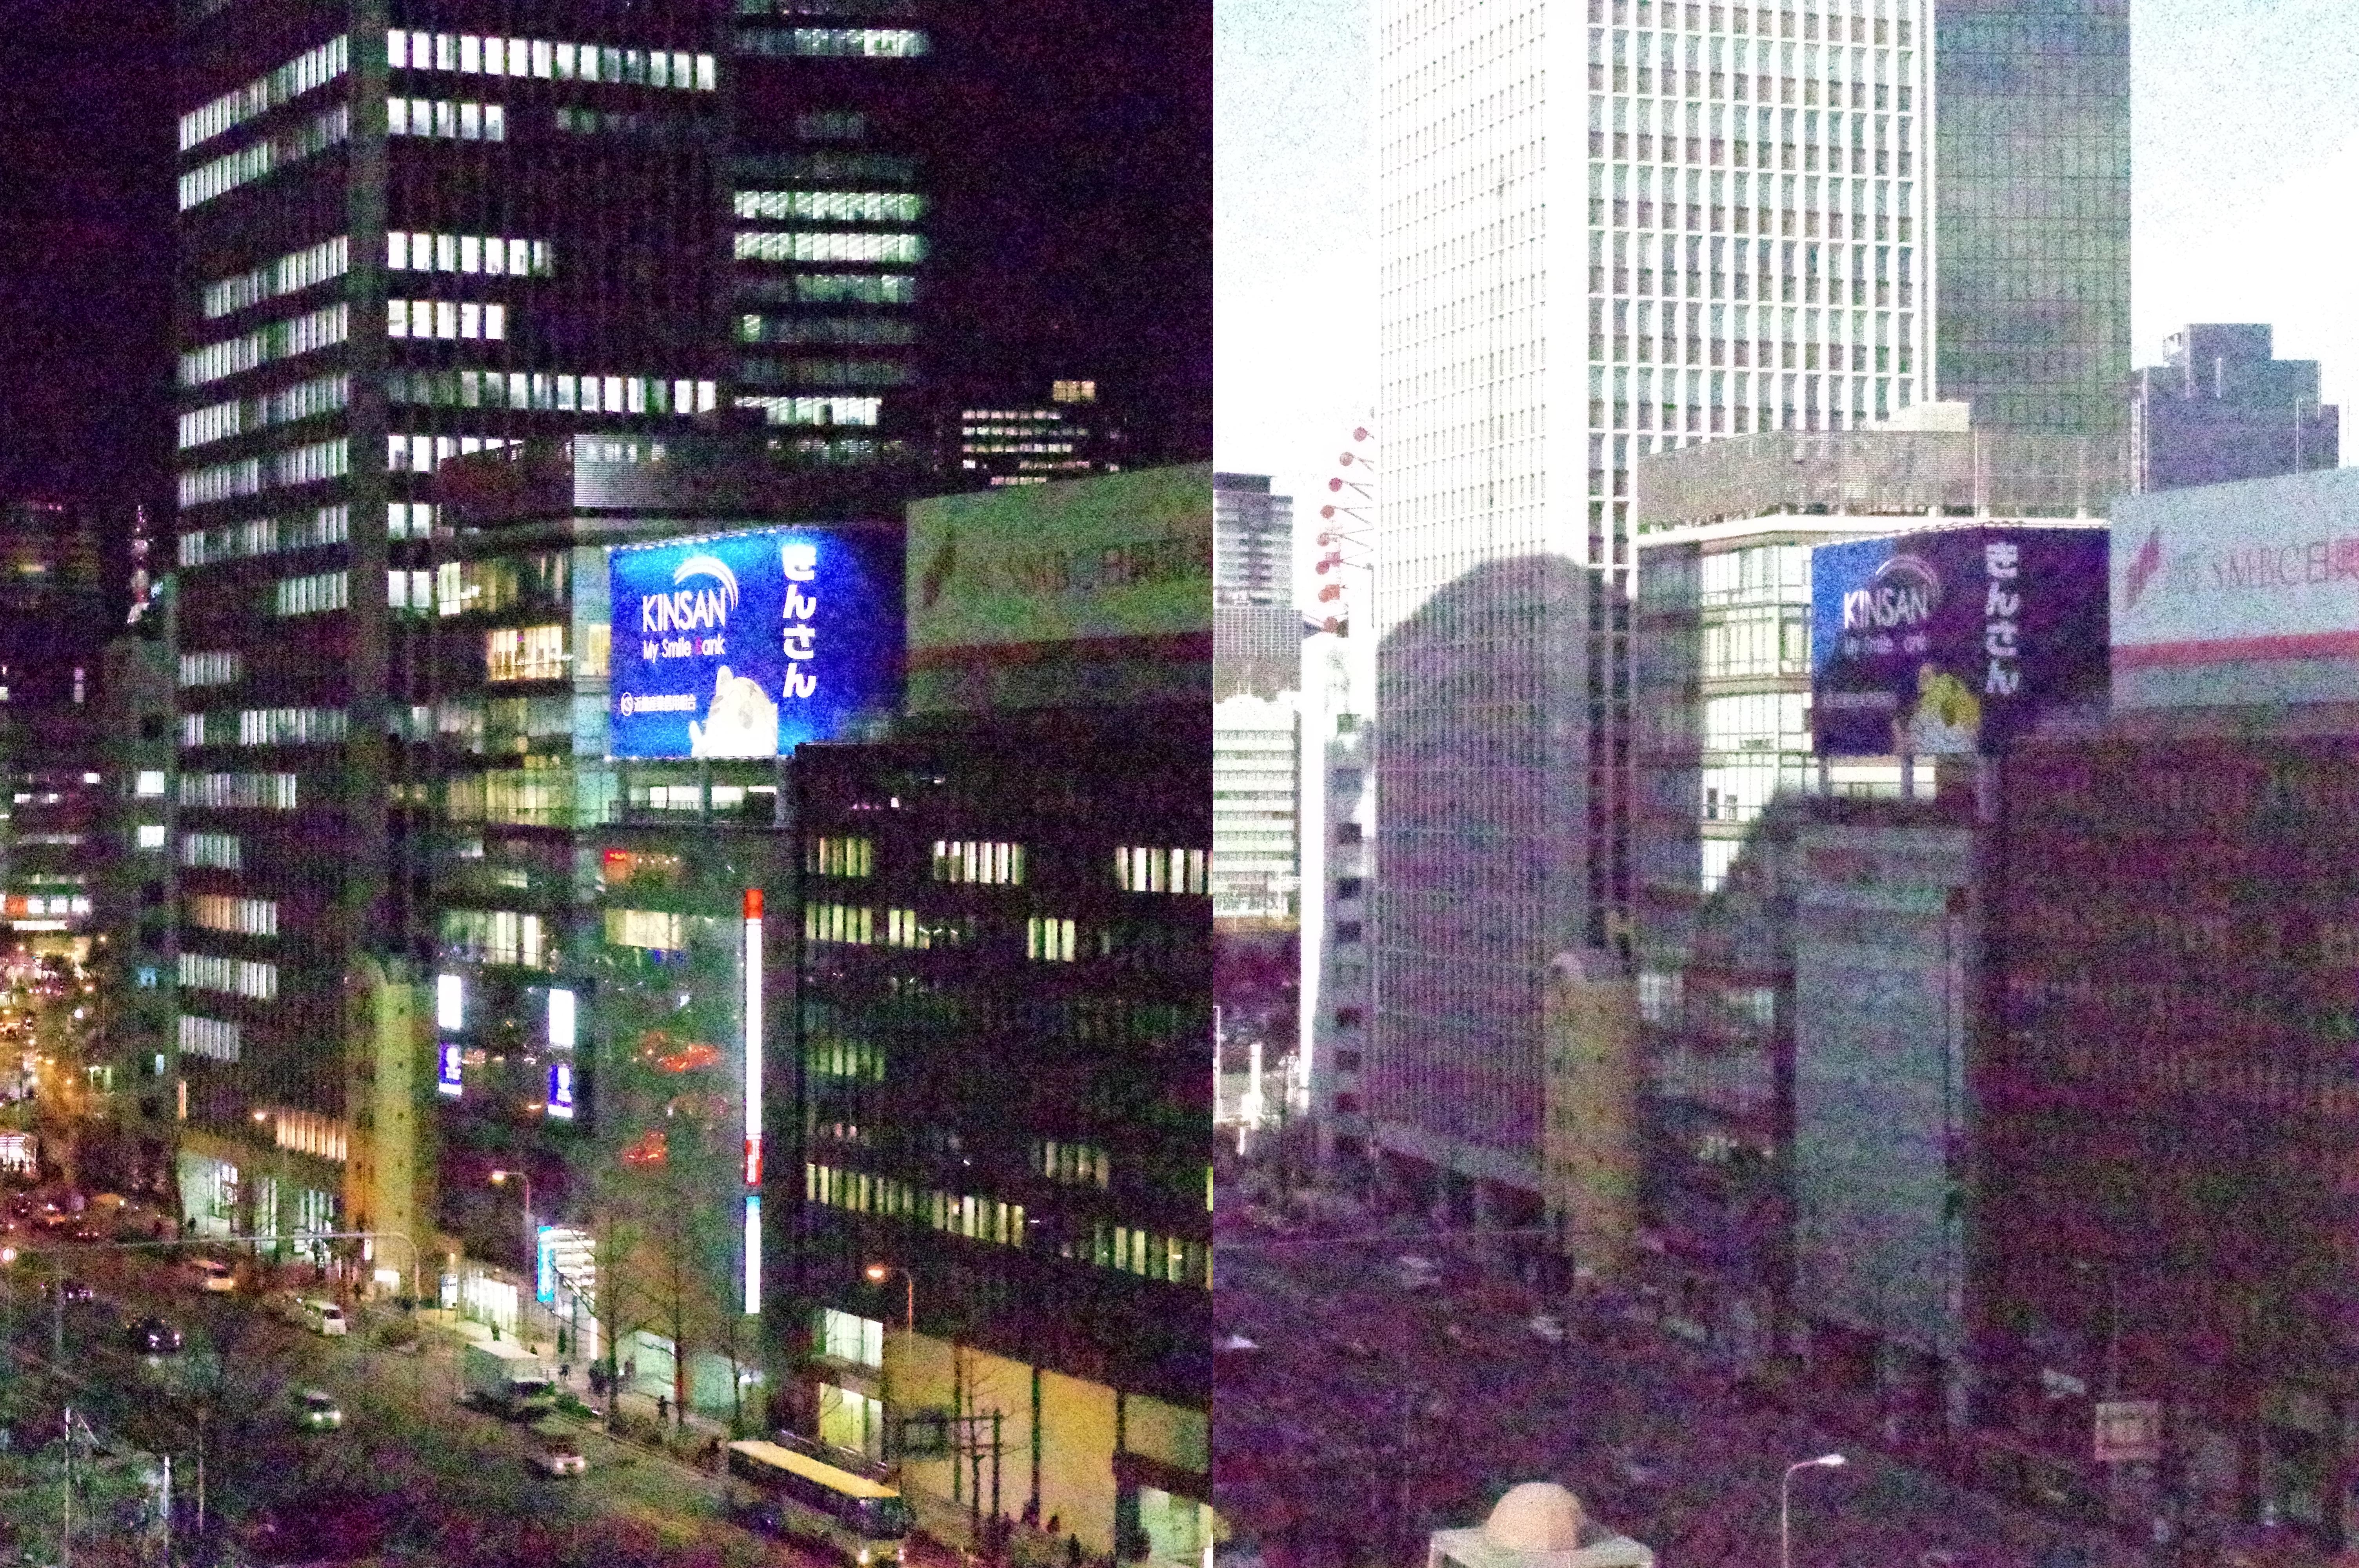 http://www.yaotomi.co.jp/blog/used/KP-ISO-1013.jpg